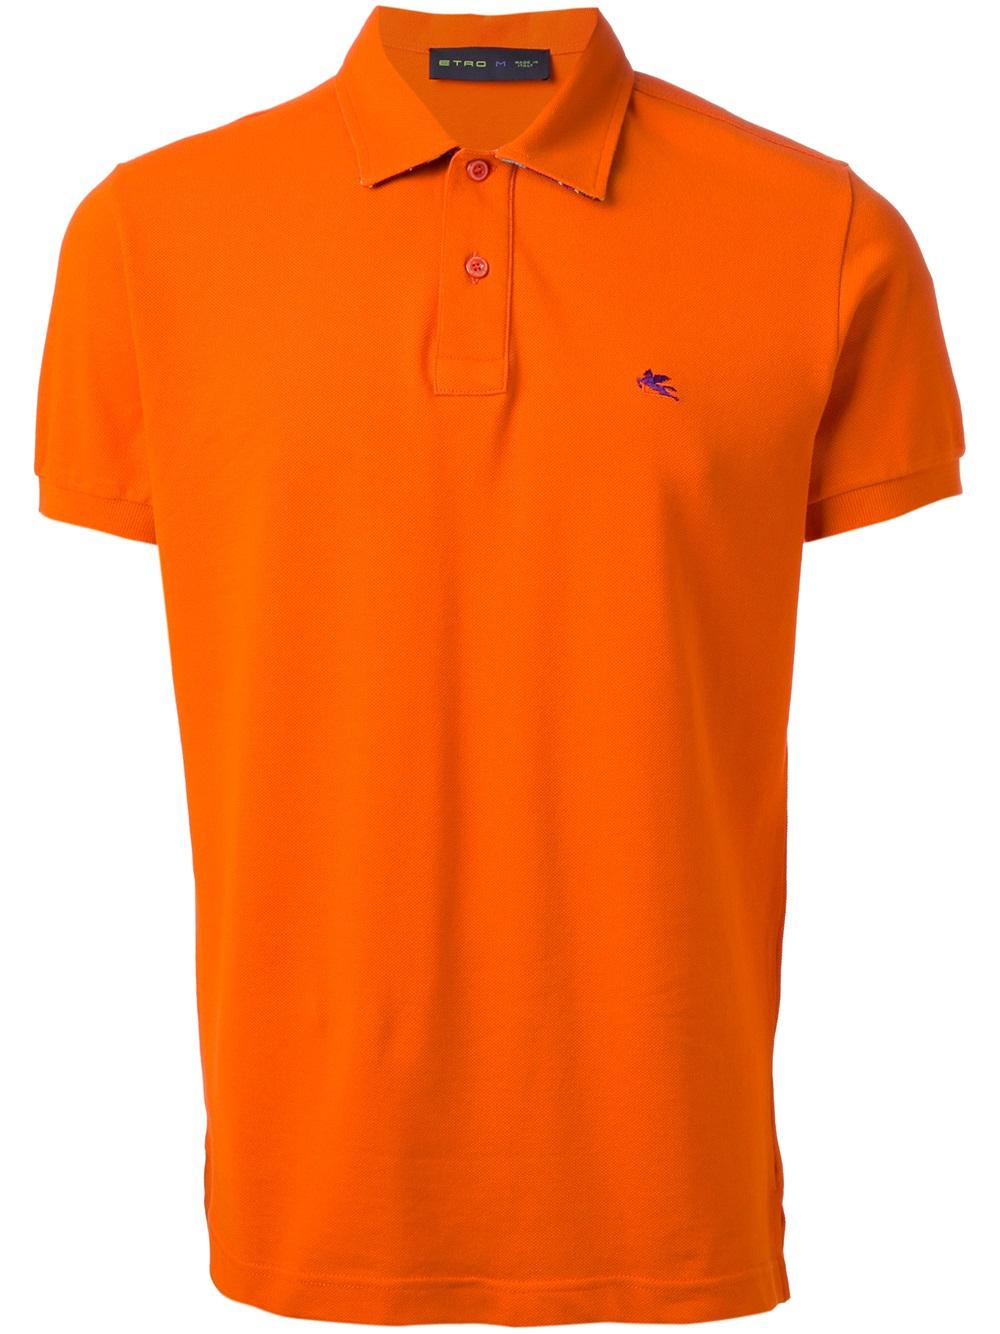 Etro Short Sleeve Polo Shirt In Orange For Men Yellow